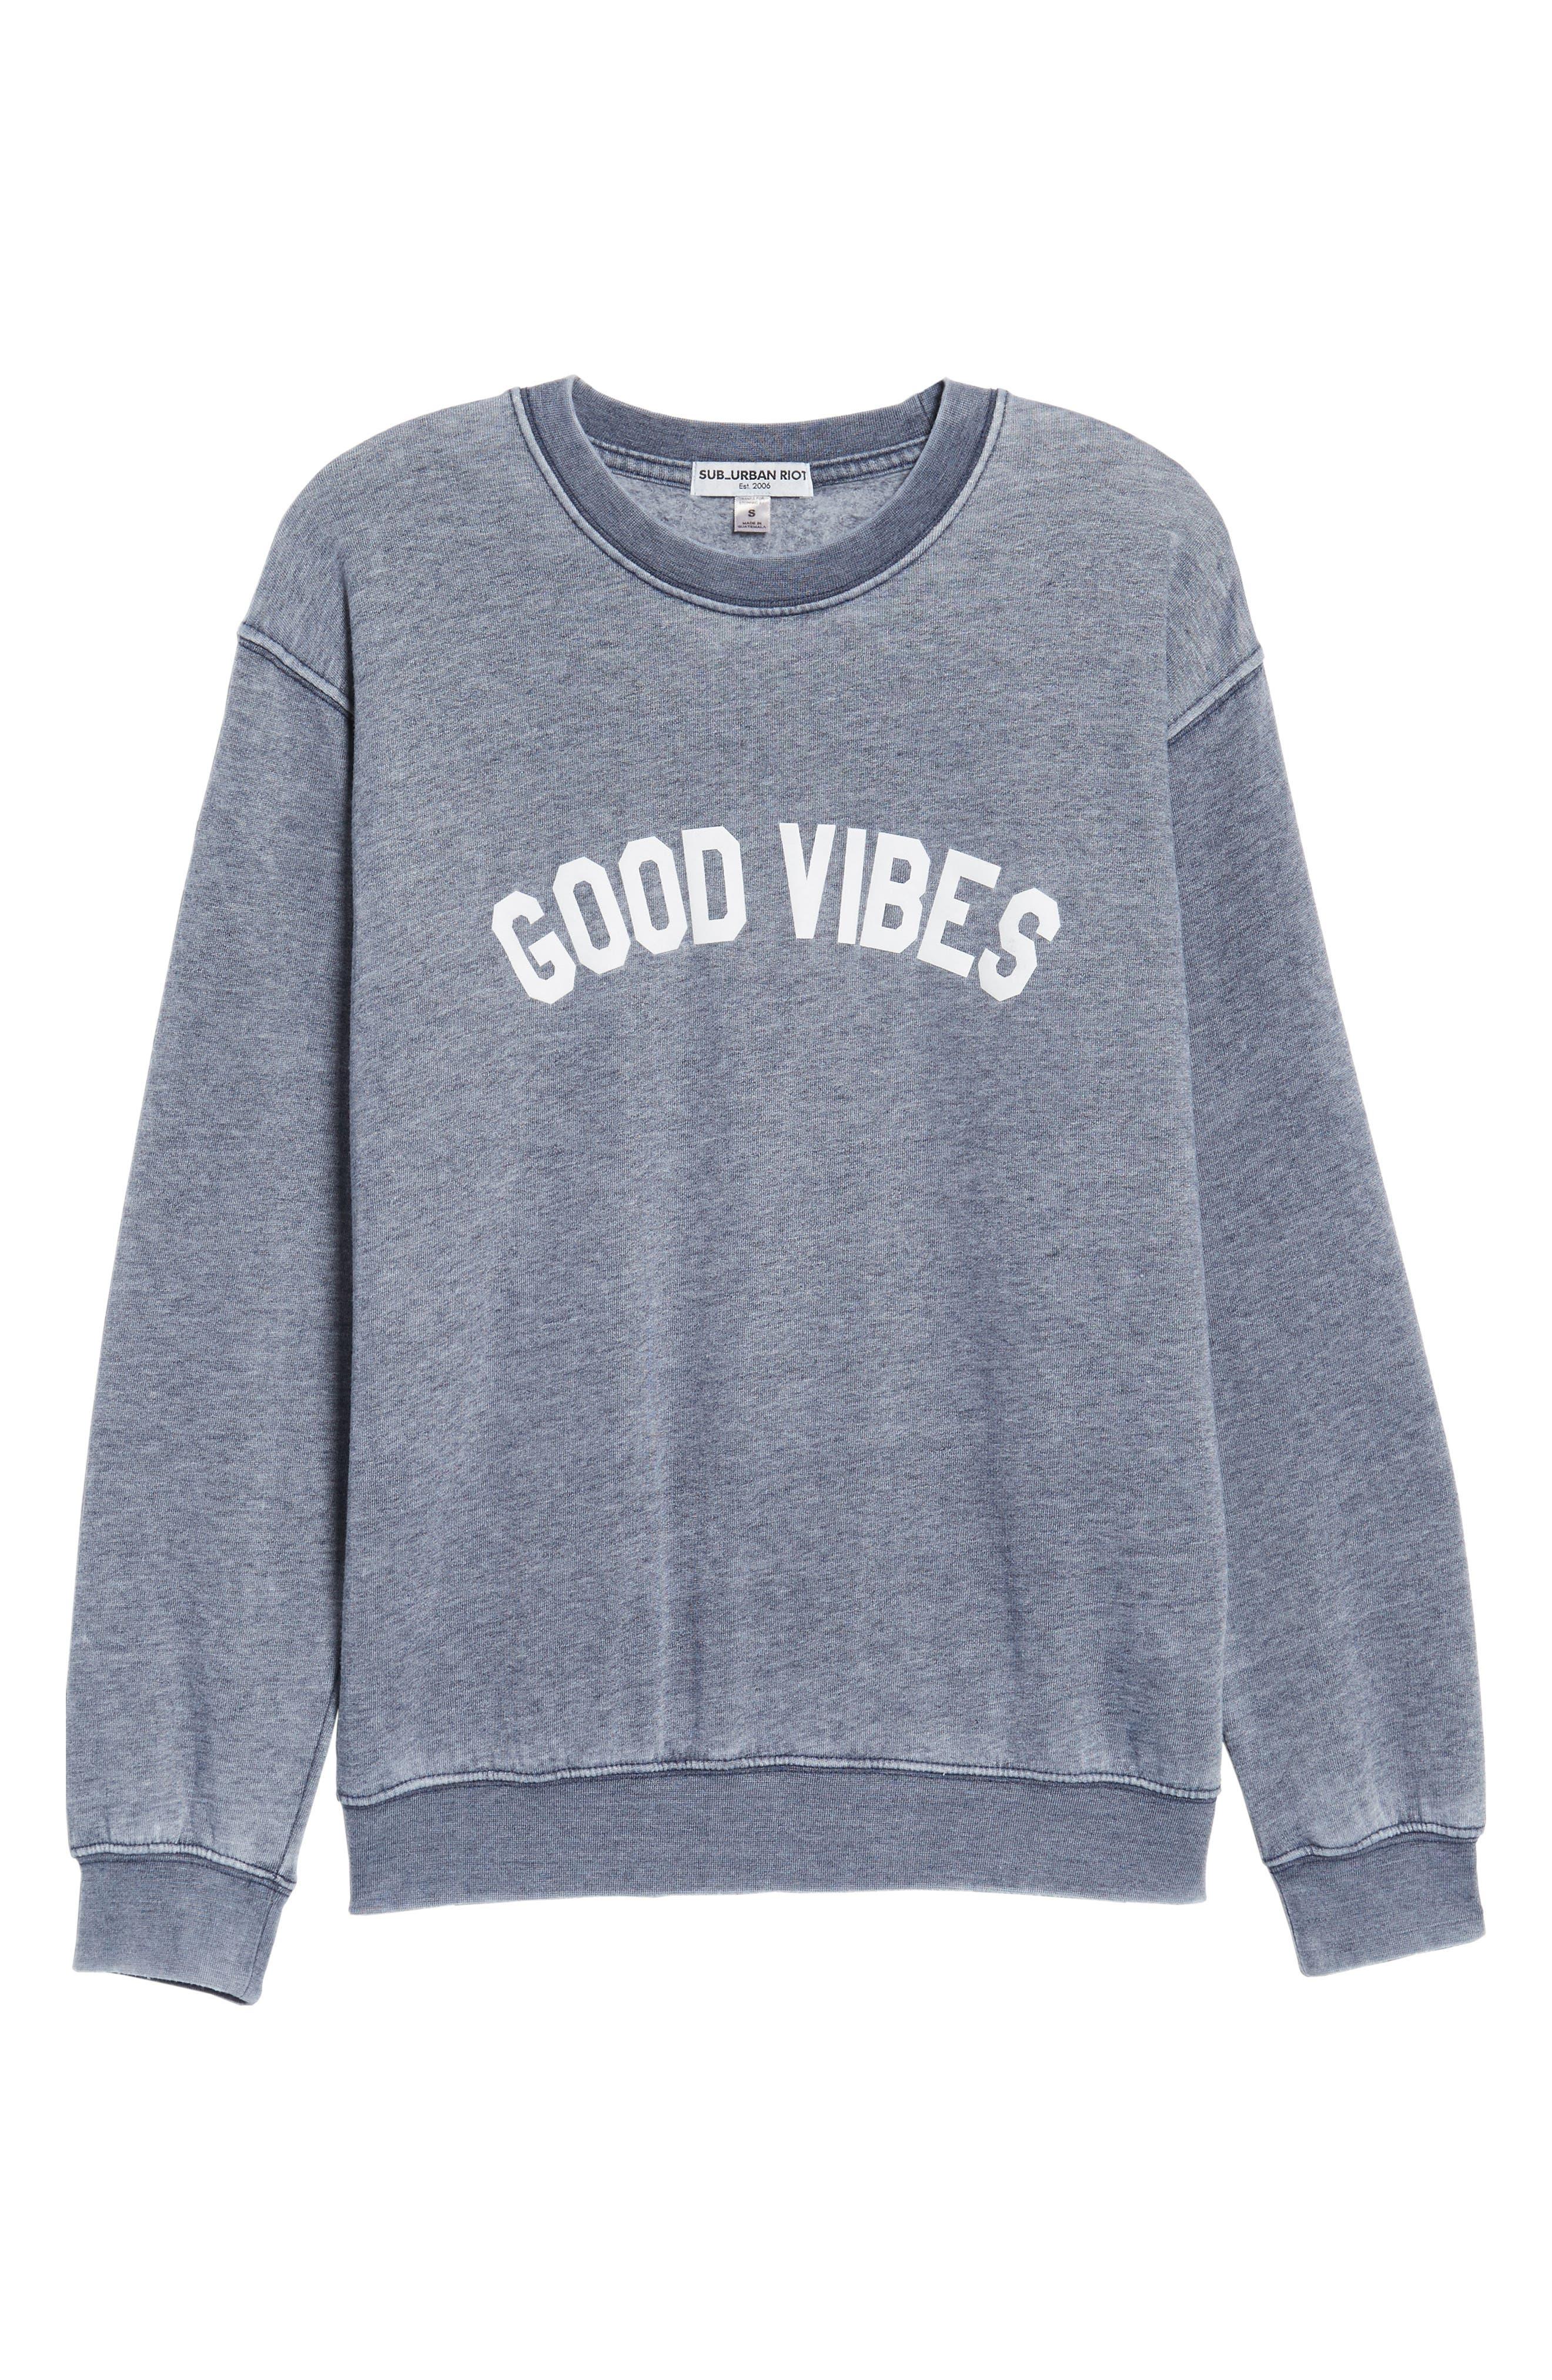 Good Vibes Burnout Sweatshirt,                             Alternate thumbnail 6, color,                             400